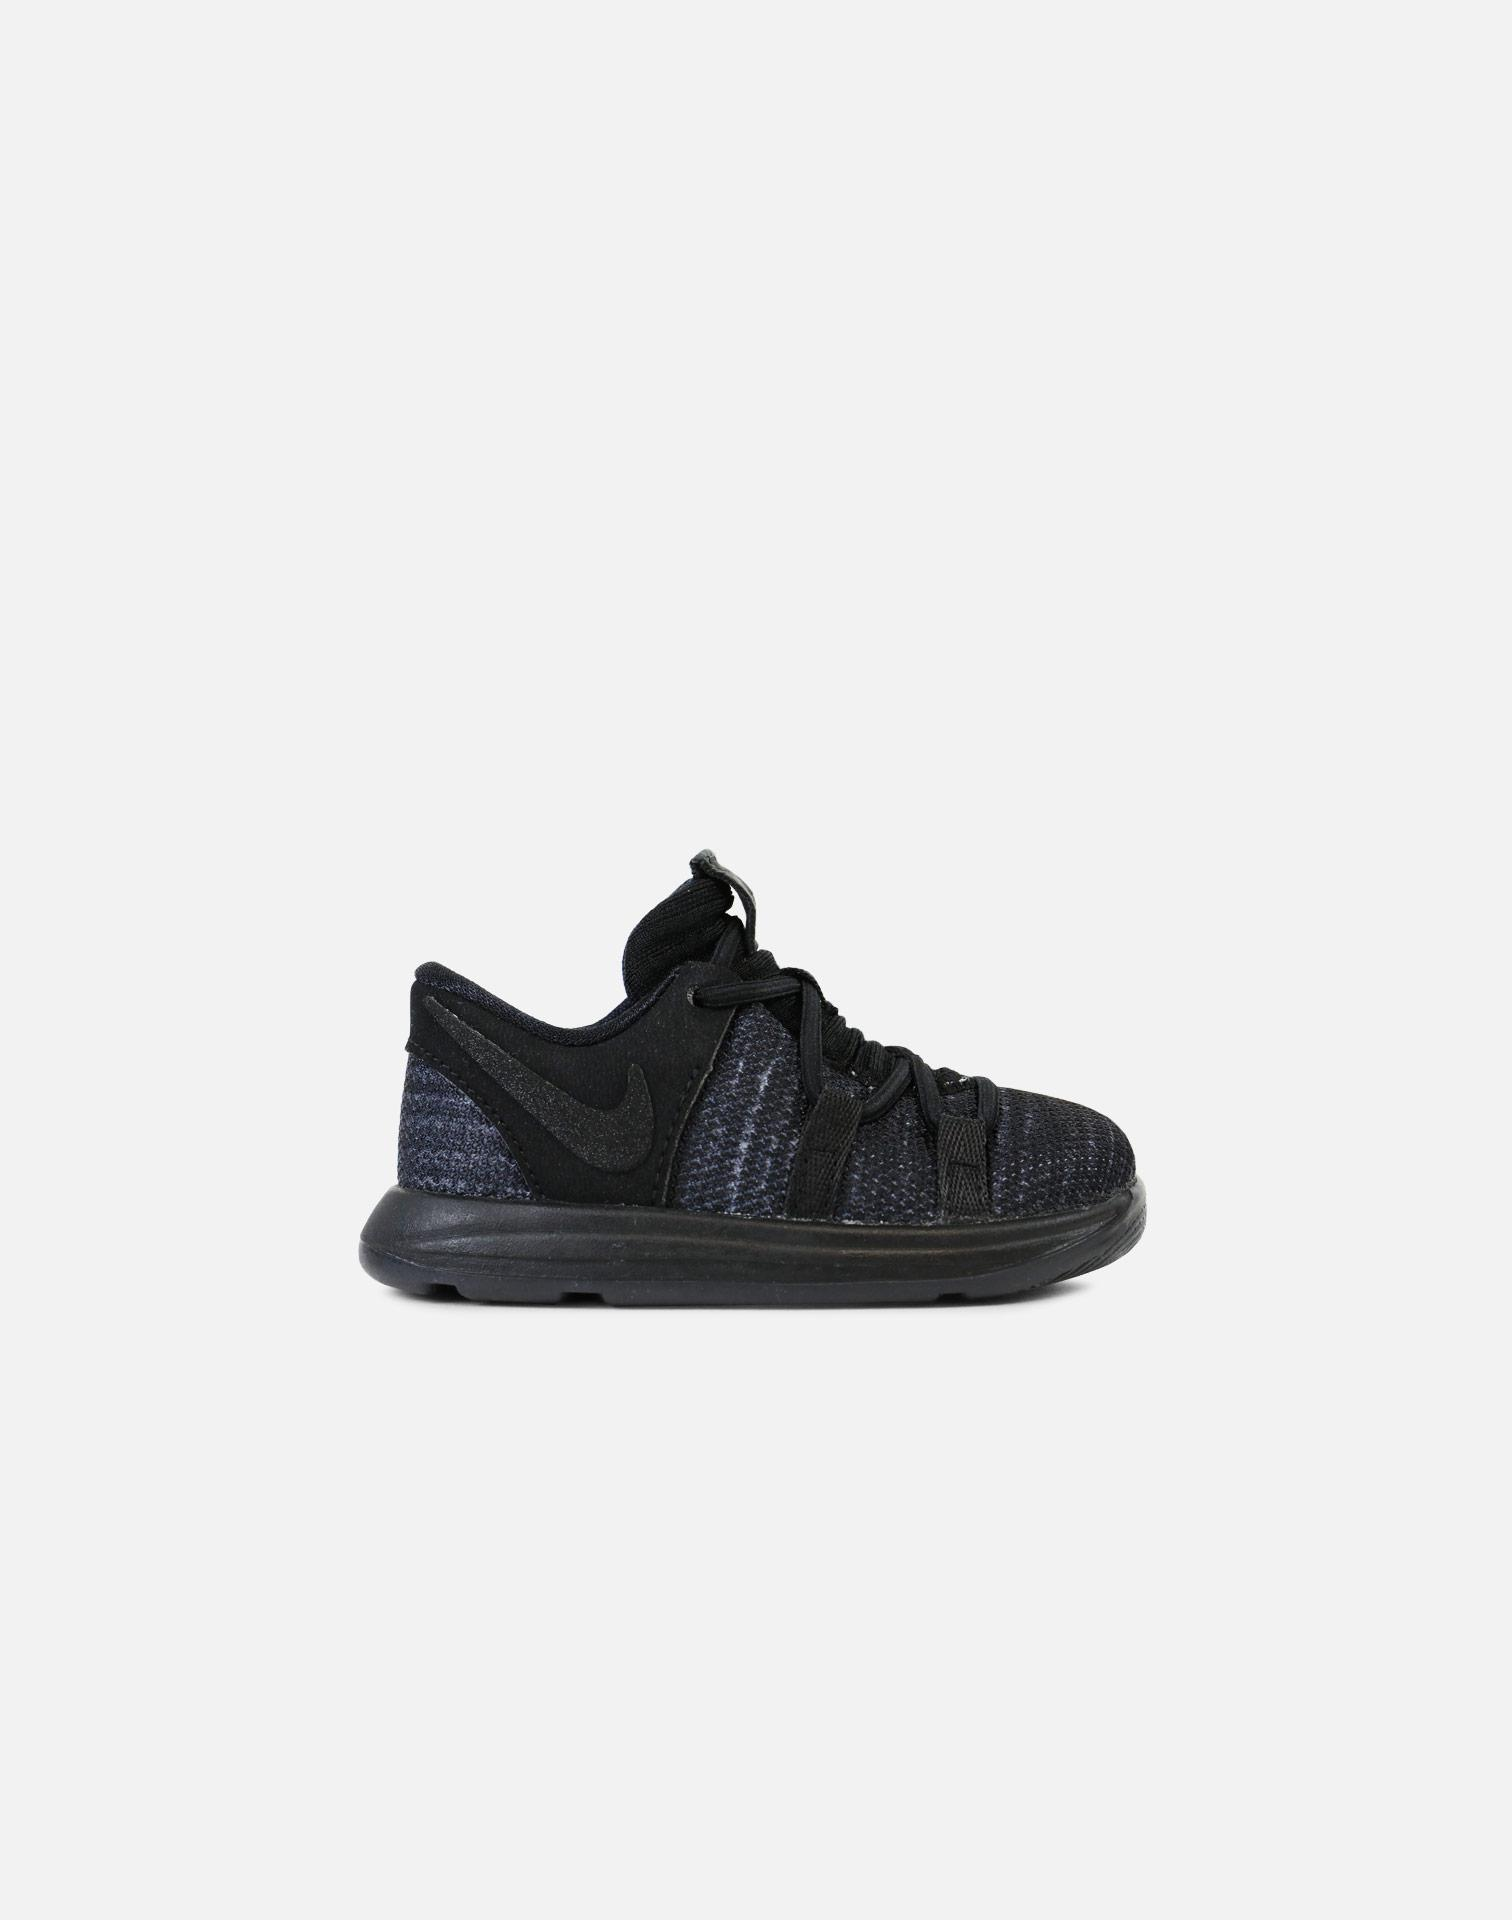 5df8515c961c Lyst - Nike Kd 10 Infant in Black for Men